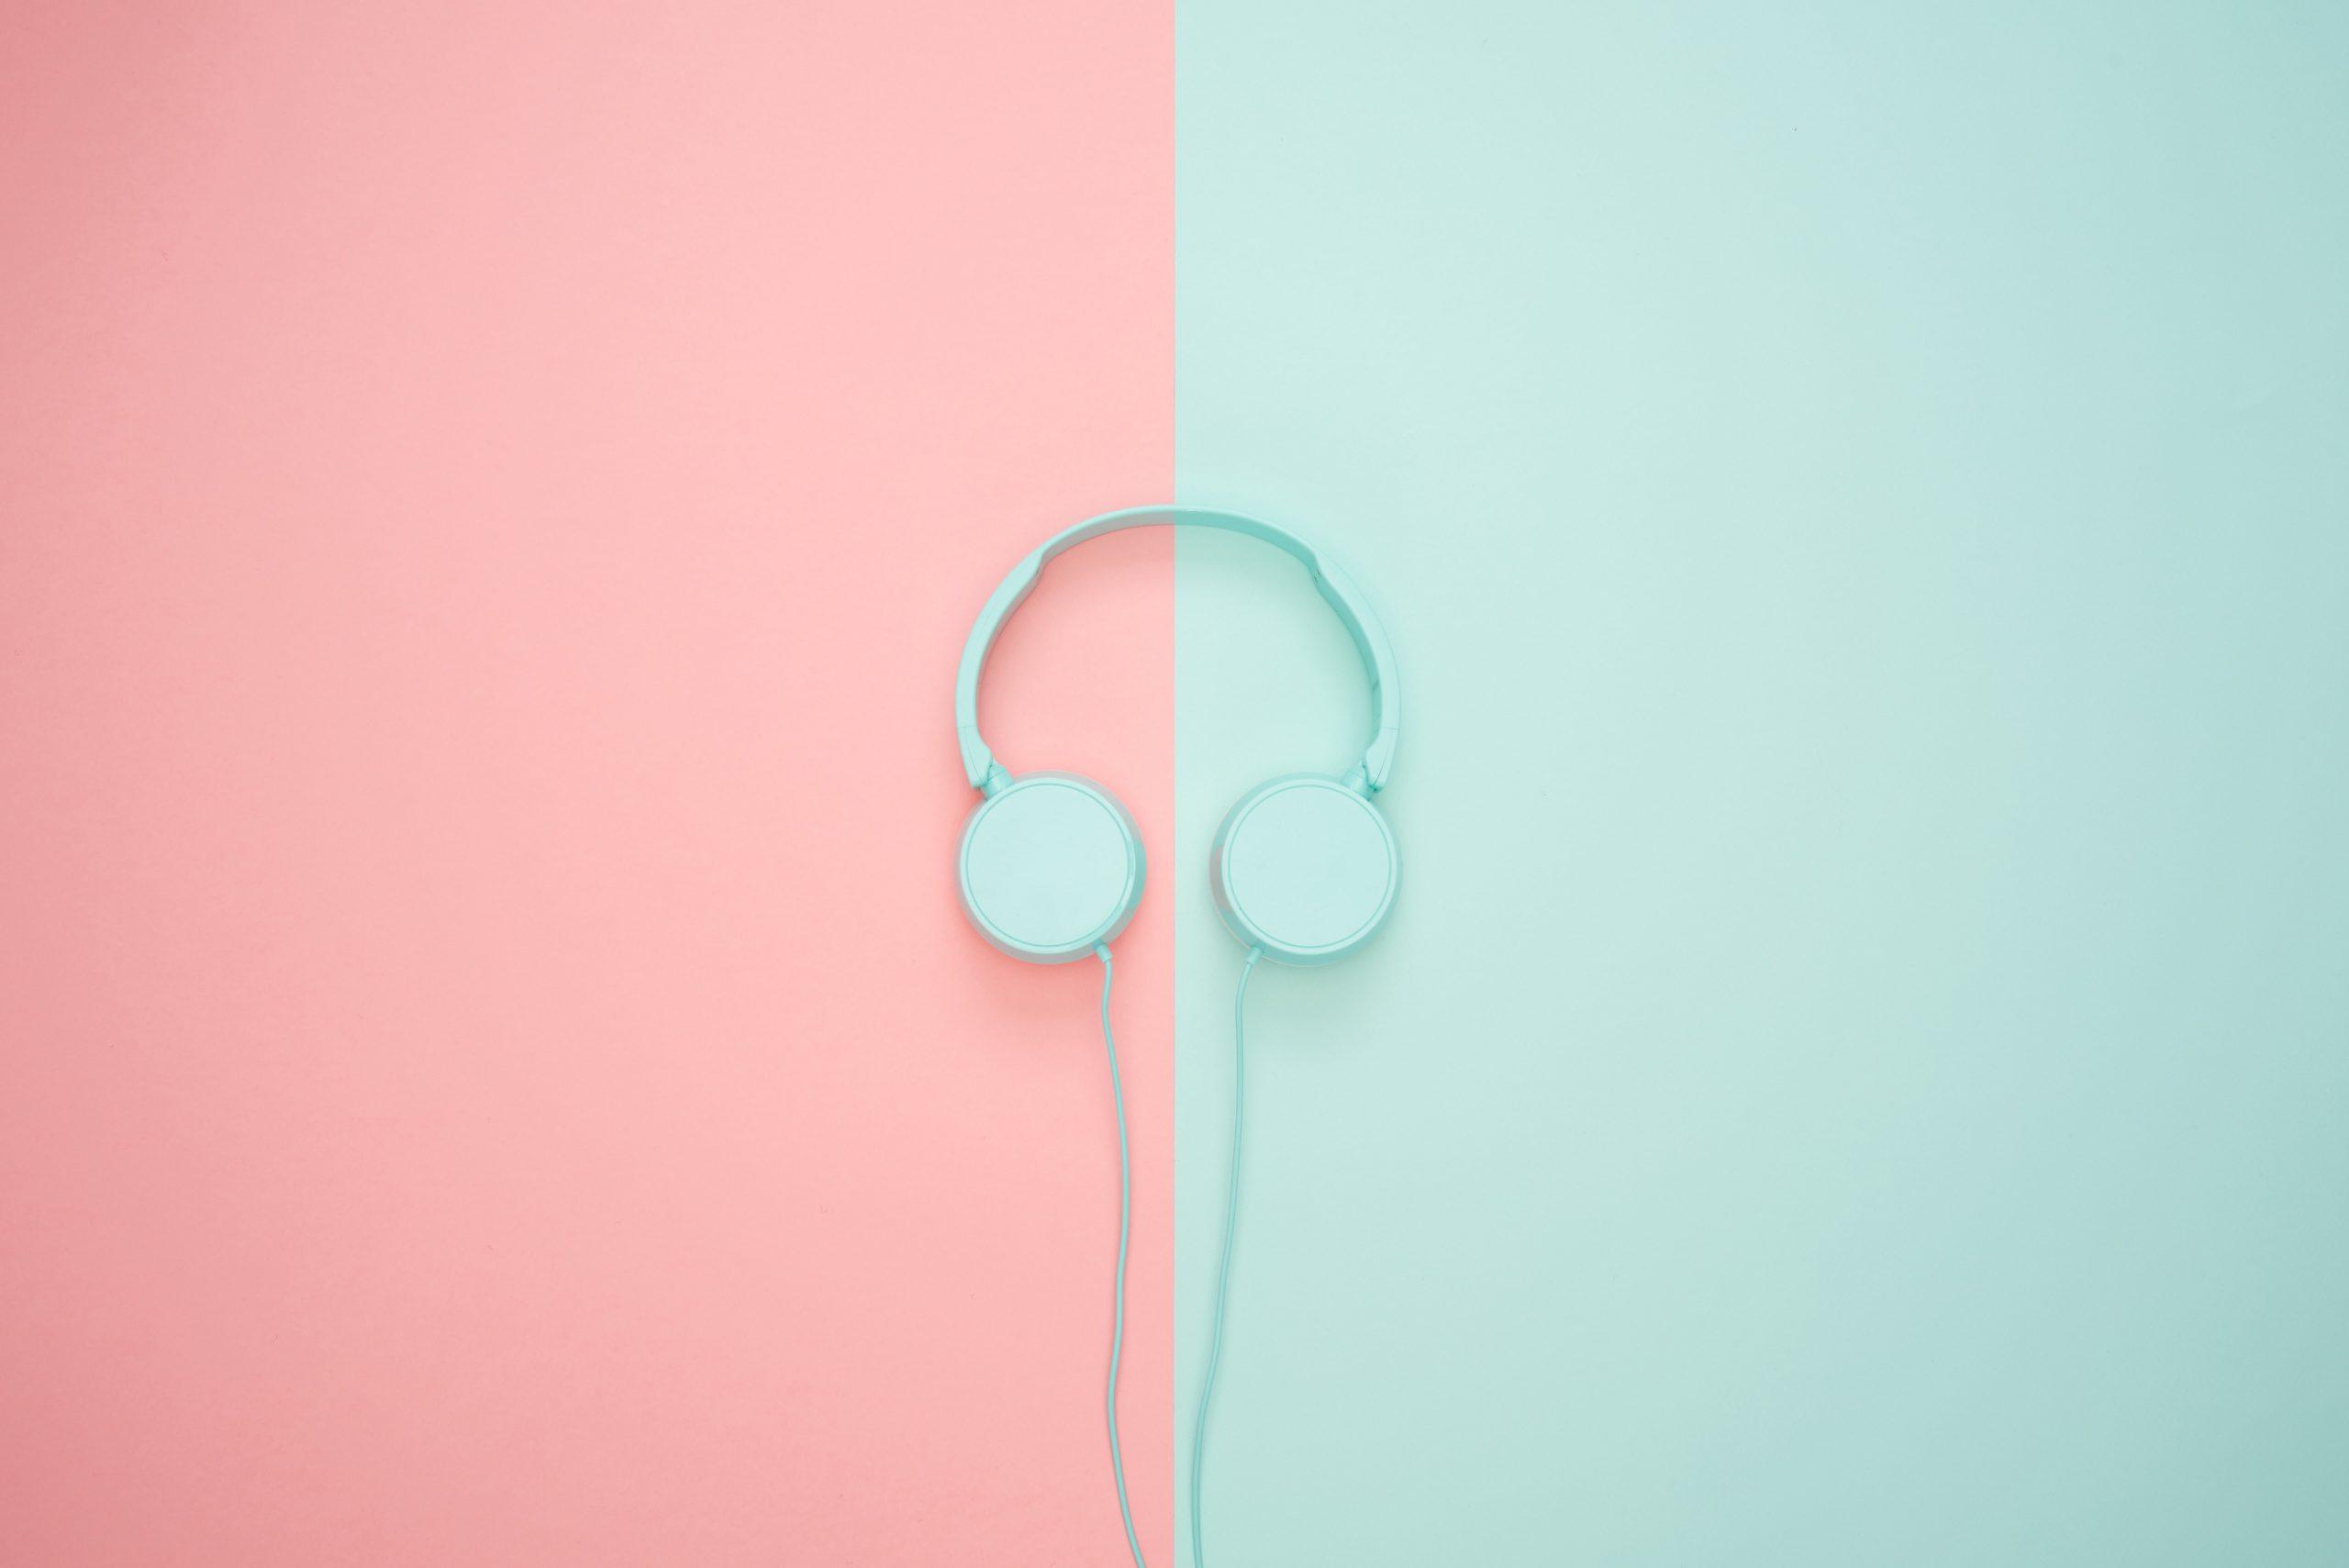 Aesthetic retro wallpaper · aesthetic rose wallpaper · aesthetic tumblr wallpaper · aesthetic wallpaper for ipad · aesthetic wallpaper pink. Headphones minimalism pastel pink • Wallpaper For You HD